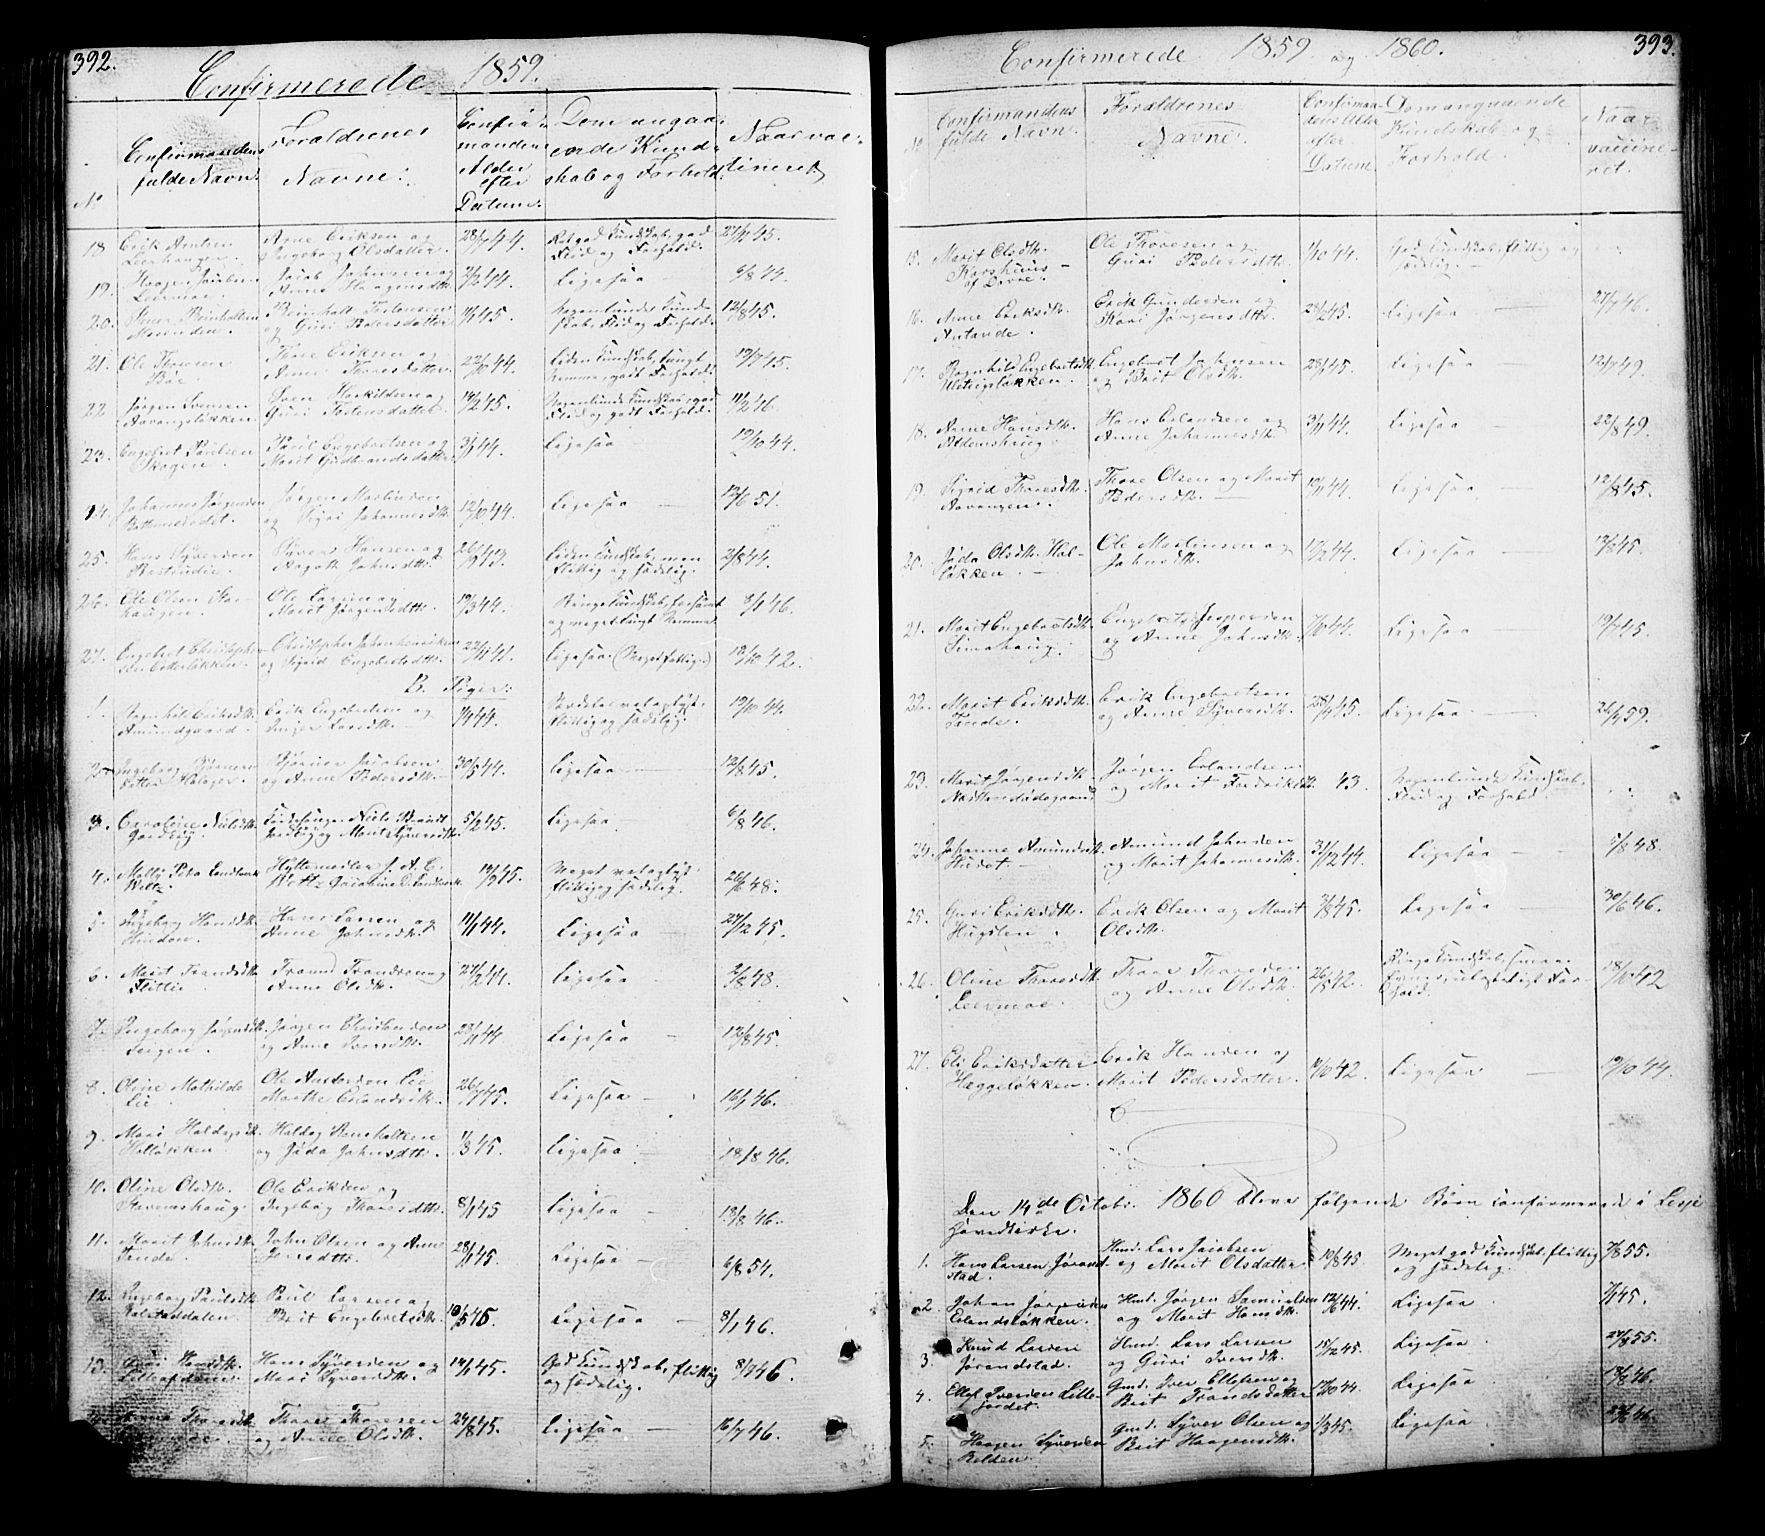 SAH, Lesja prestekontor, Klokkerbok nr. 5, 1850-1894, s. 392-393